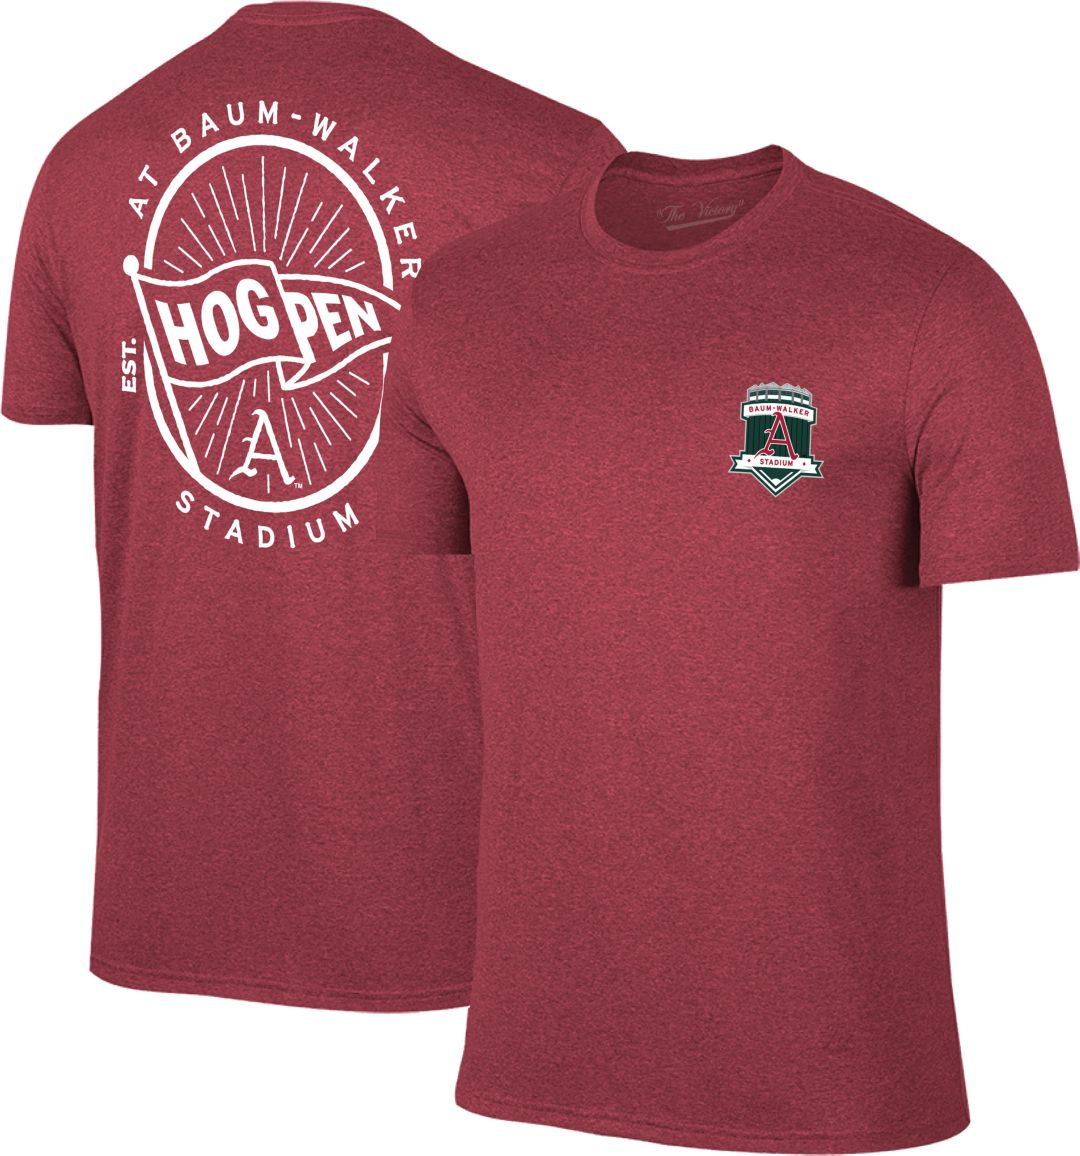 premium selection 75299 0f04b The Victory Men's Arkansas Razorbacks Cardinal Hog Pen Baseball T-Shirt